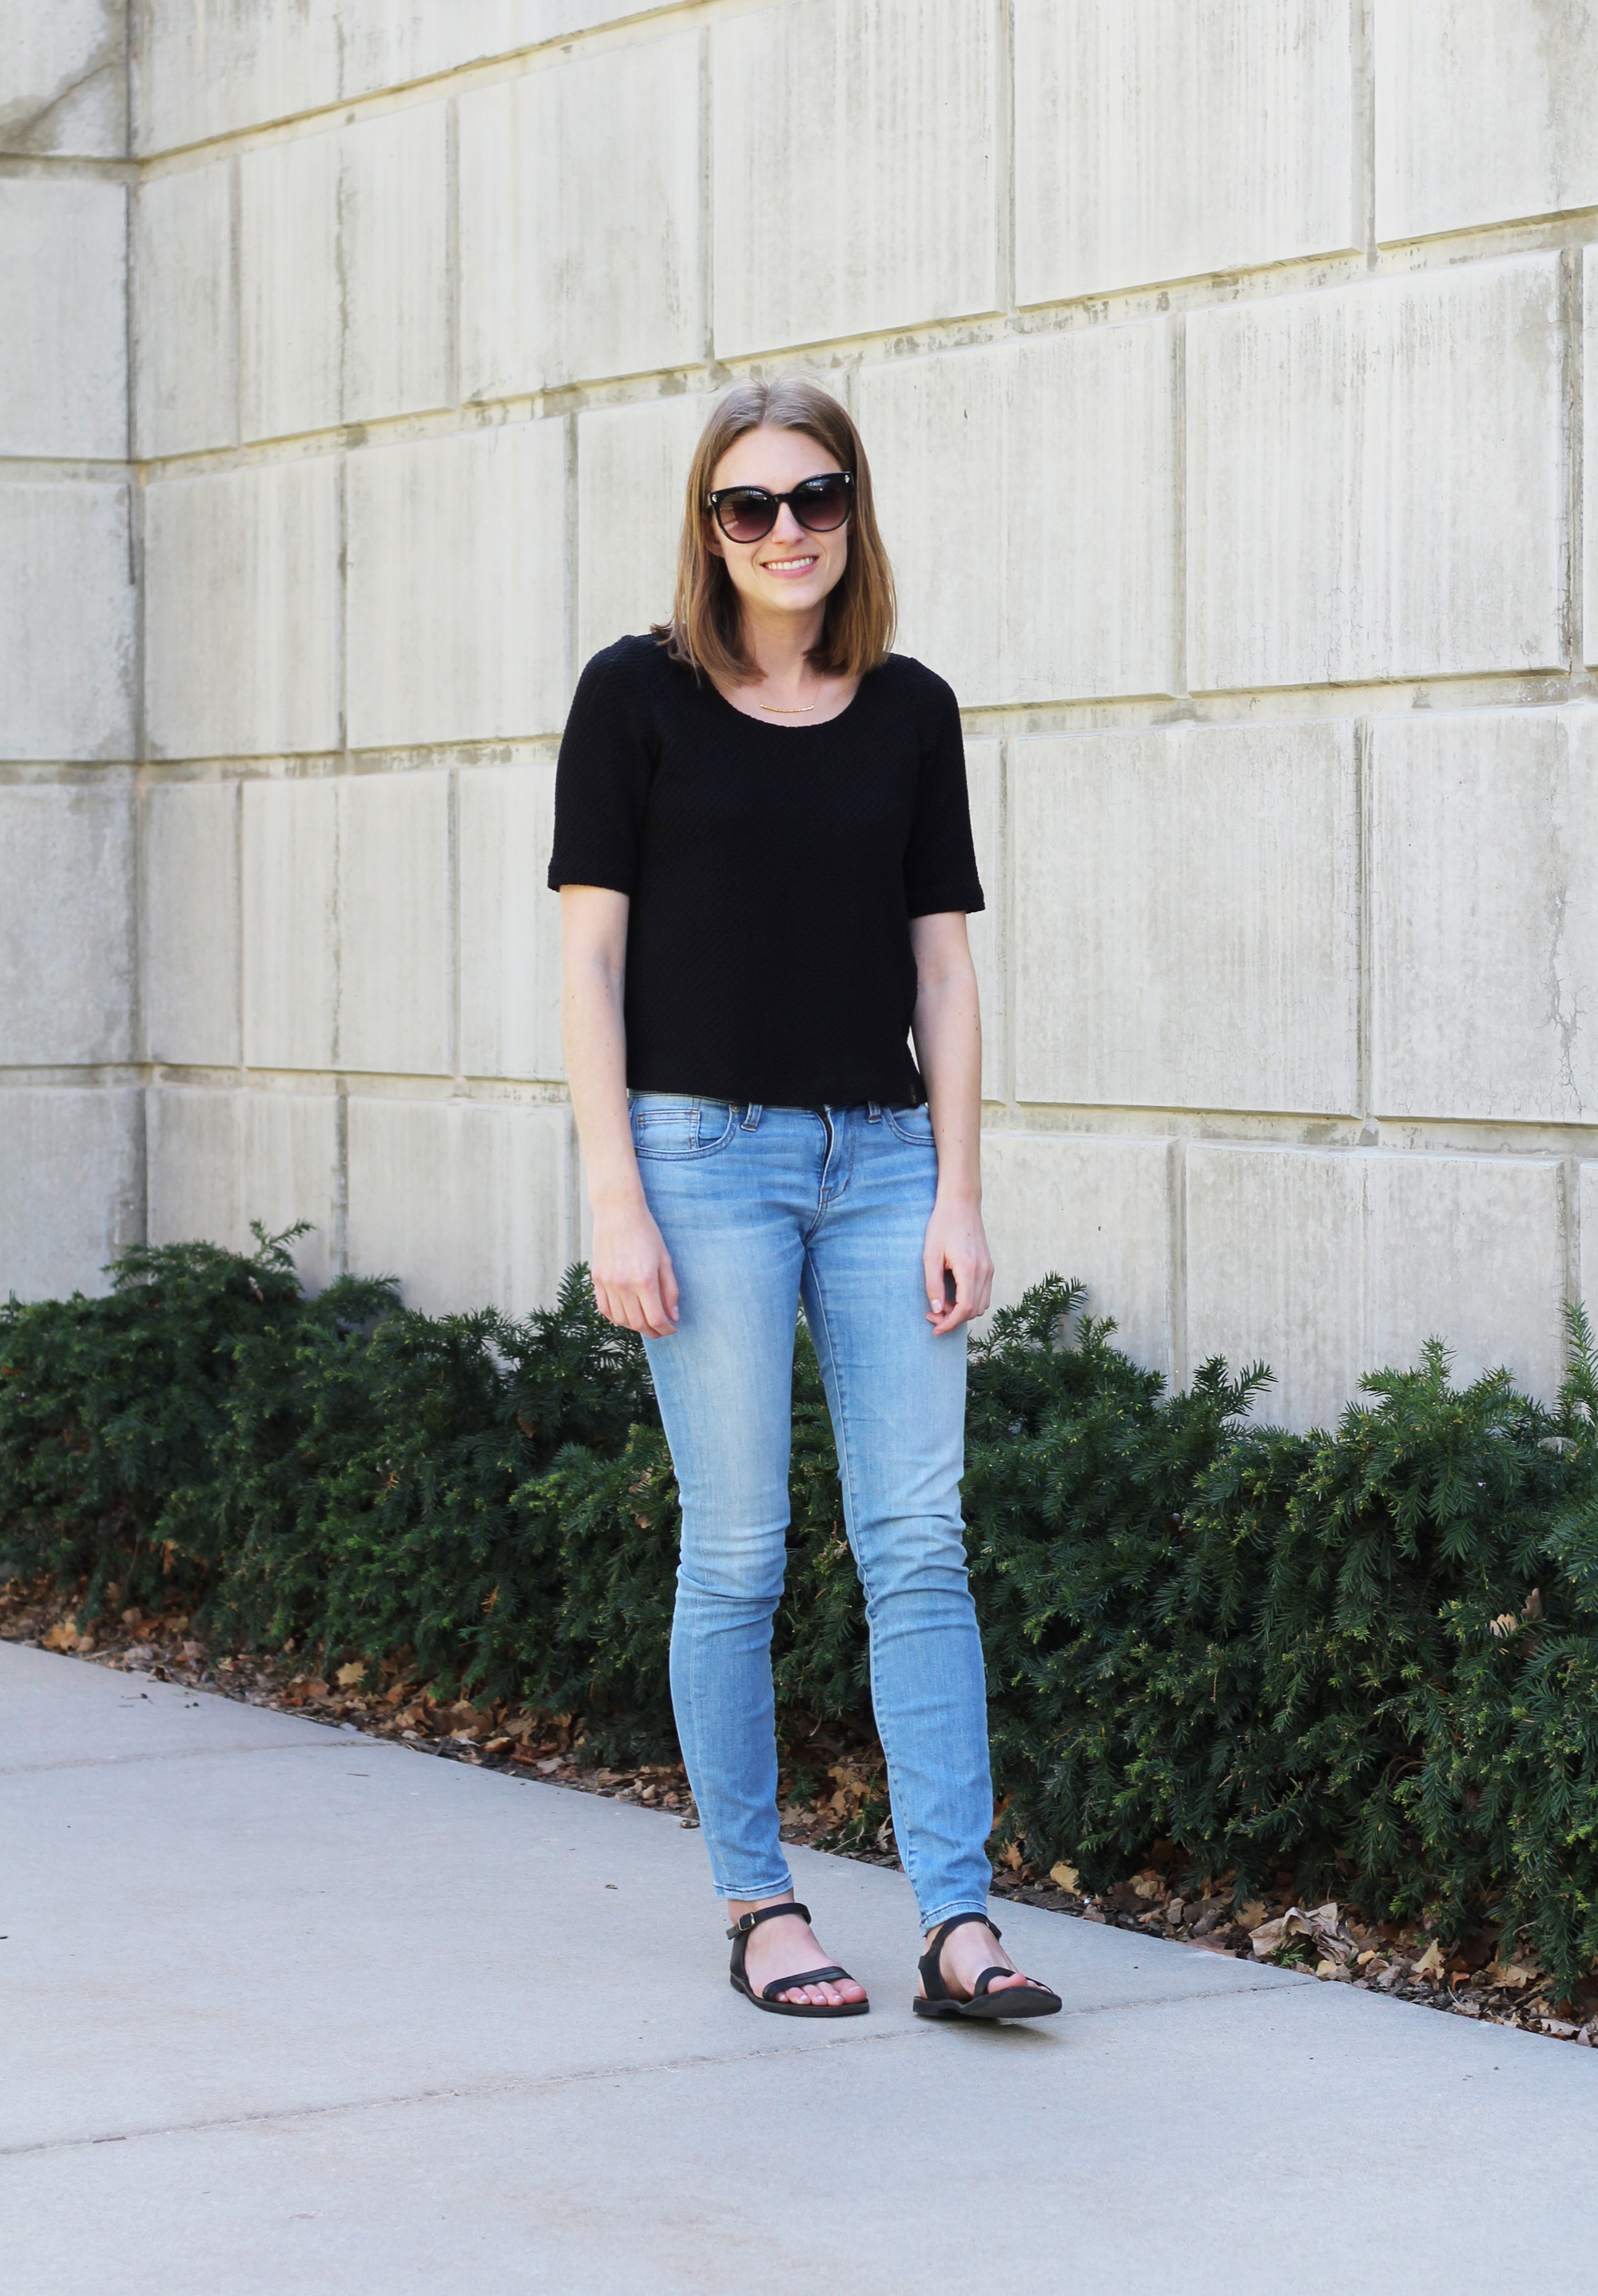 Black Anthropologie top, light wash Madewell skinny jeans, black sandals, gold Gorjana bar necklace — Cotton Cashmere Cat Hair